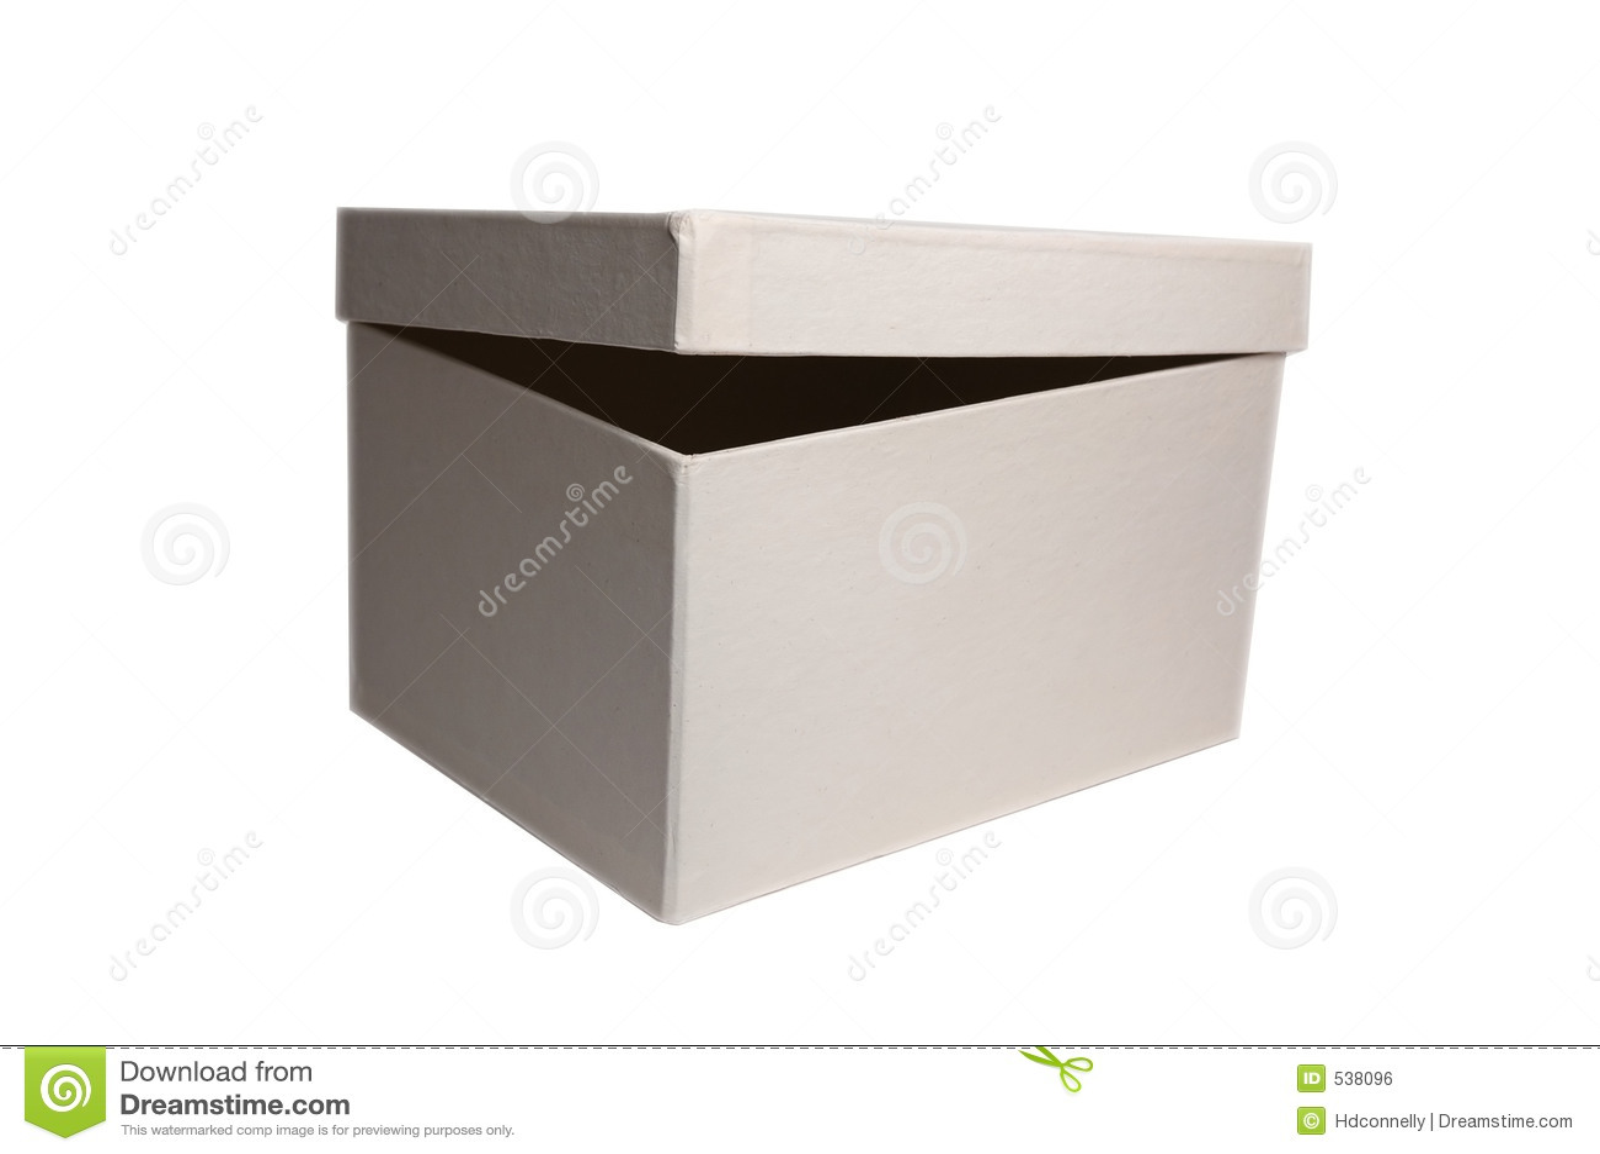 Download 配件箱礼品 库存照片. 图片 包括有 开放, 盒盖, 节假日, 产生, 邮件, 推力, 棚车, 偷看, 容器 - 538096